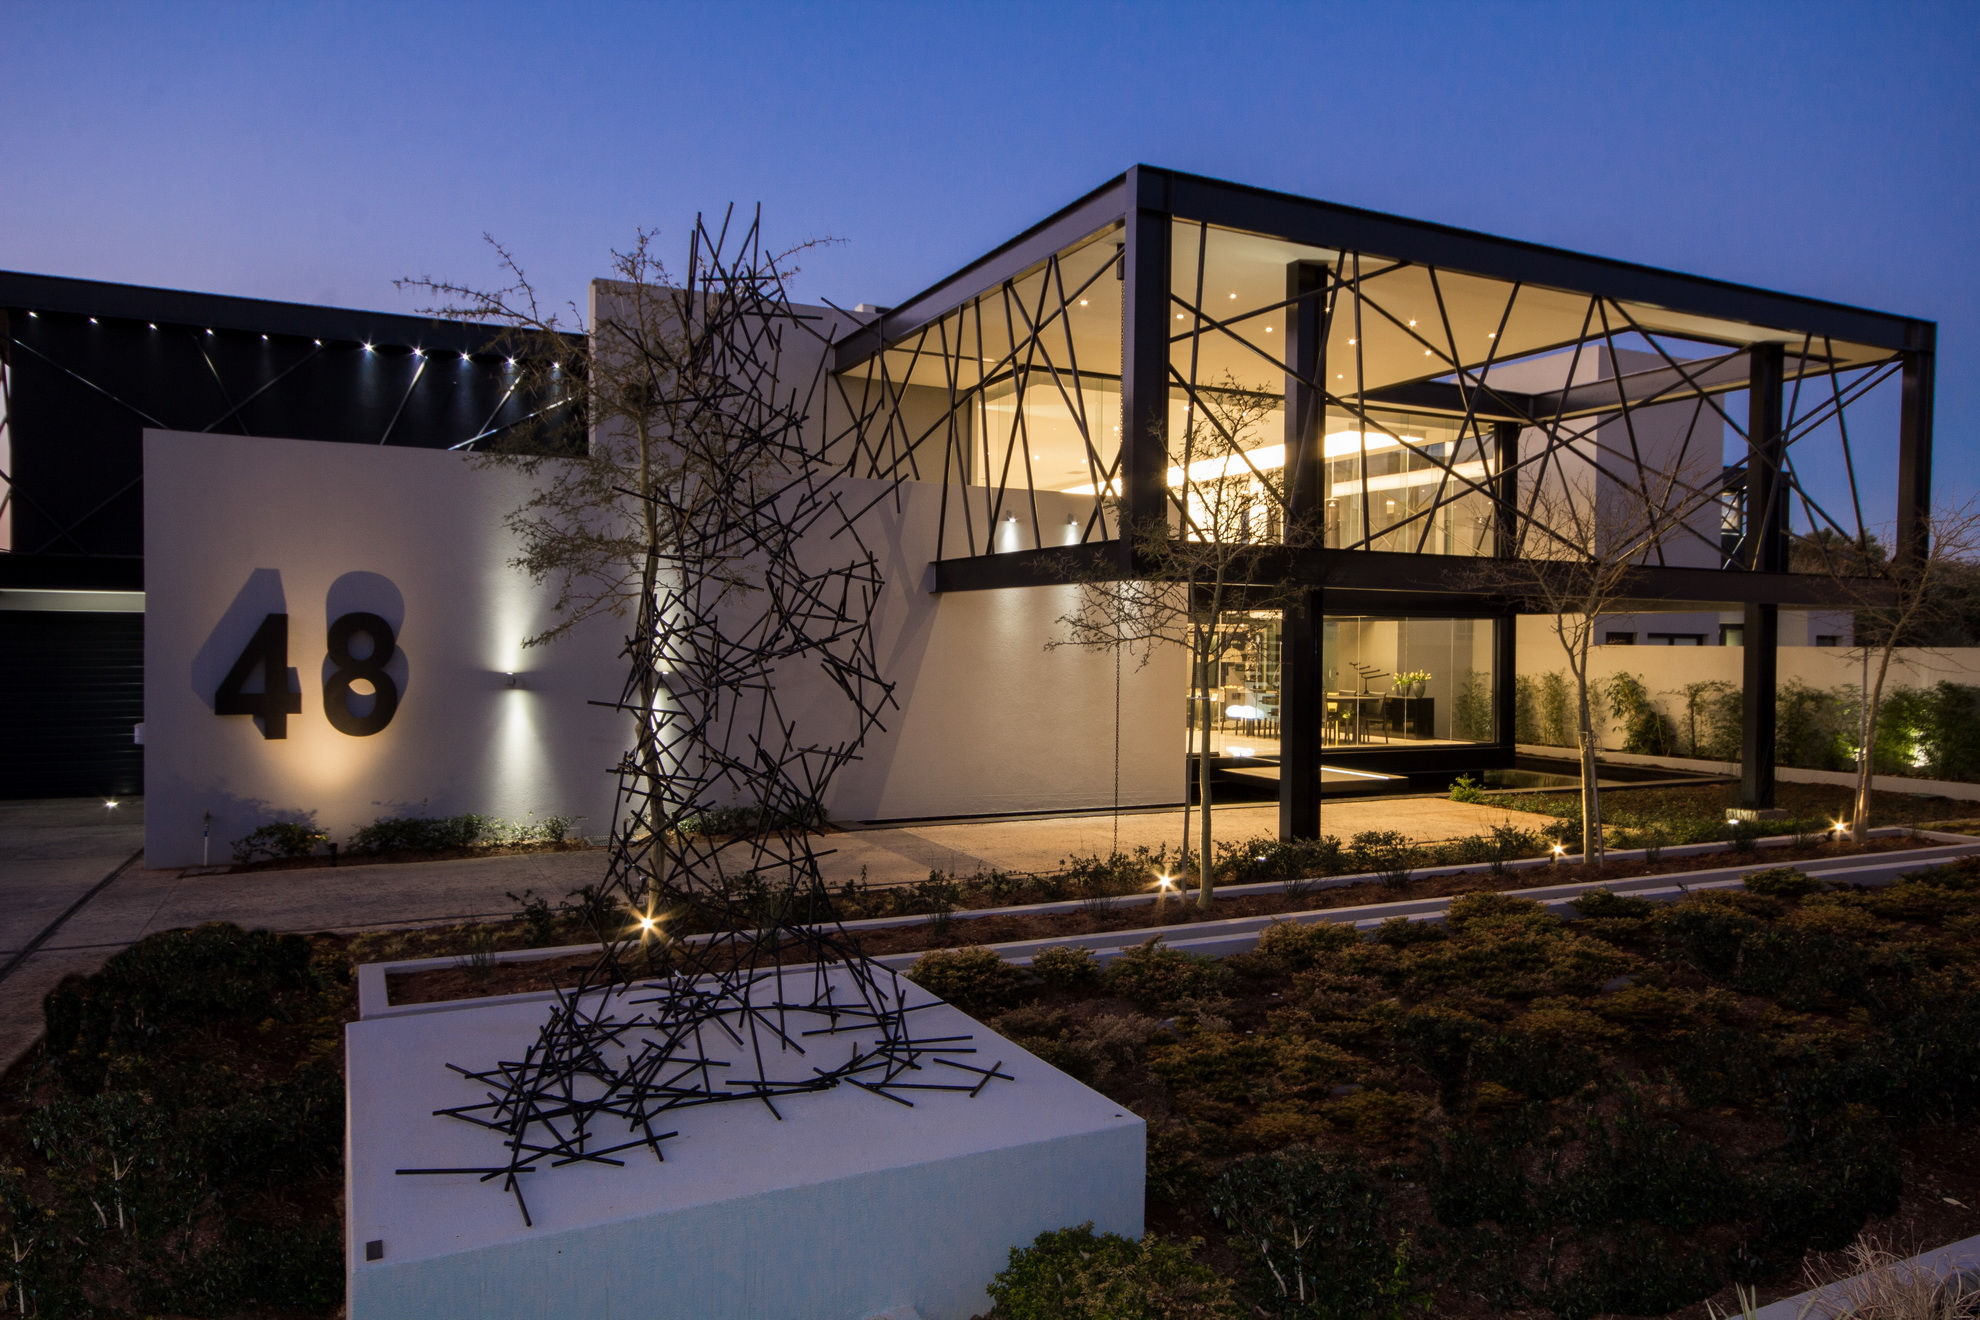 House Ber Architect Magazine Nico Van Der Meulen Architects Johannesburg South Africa